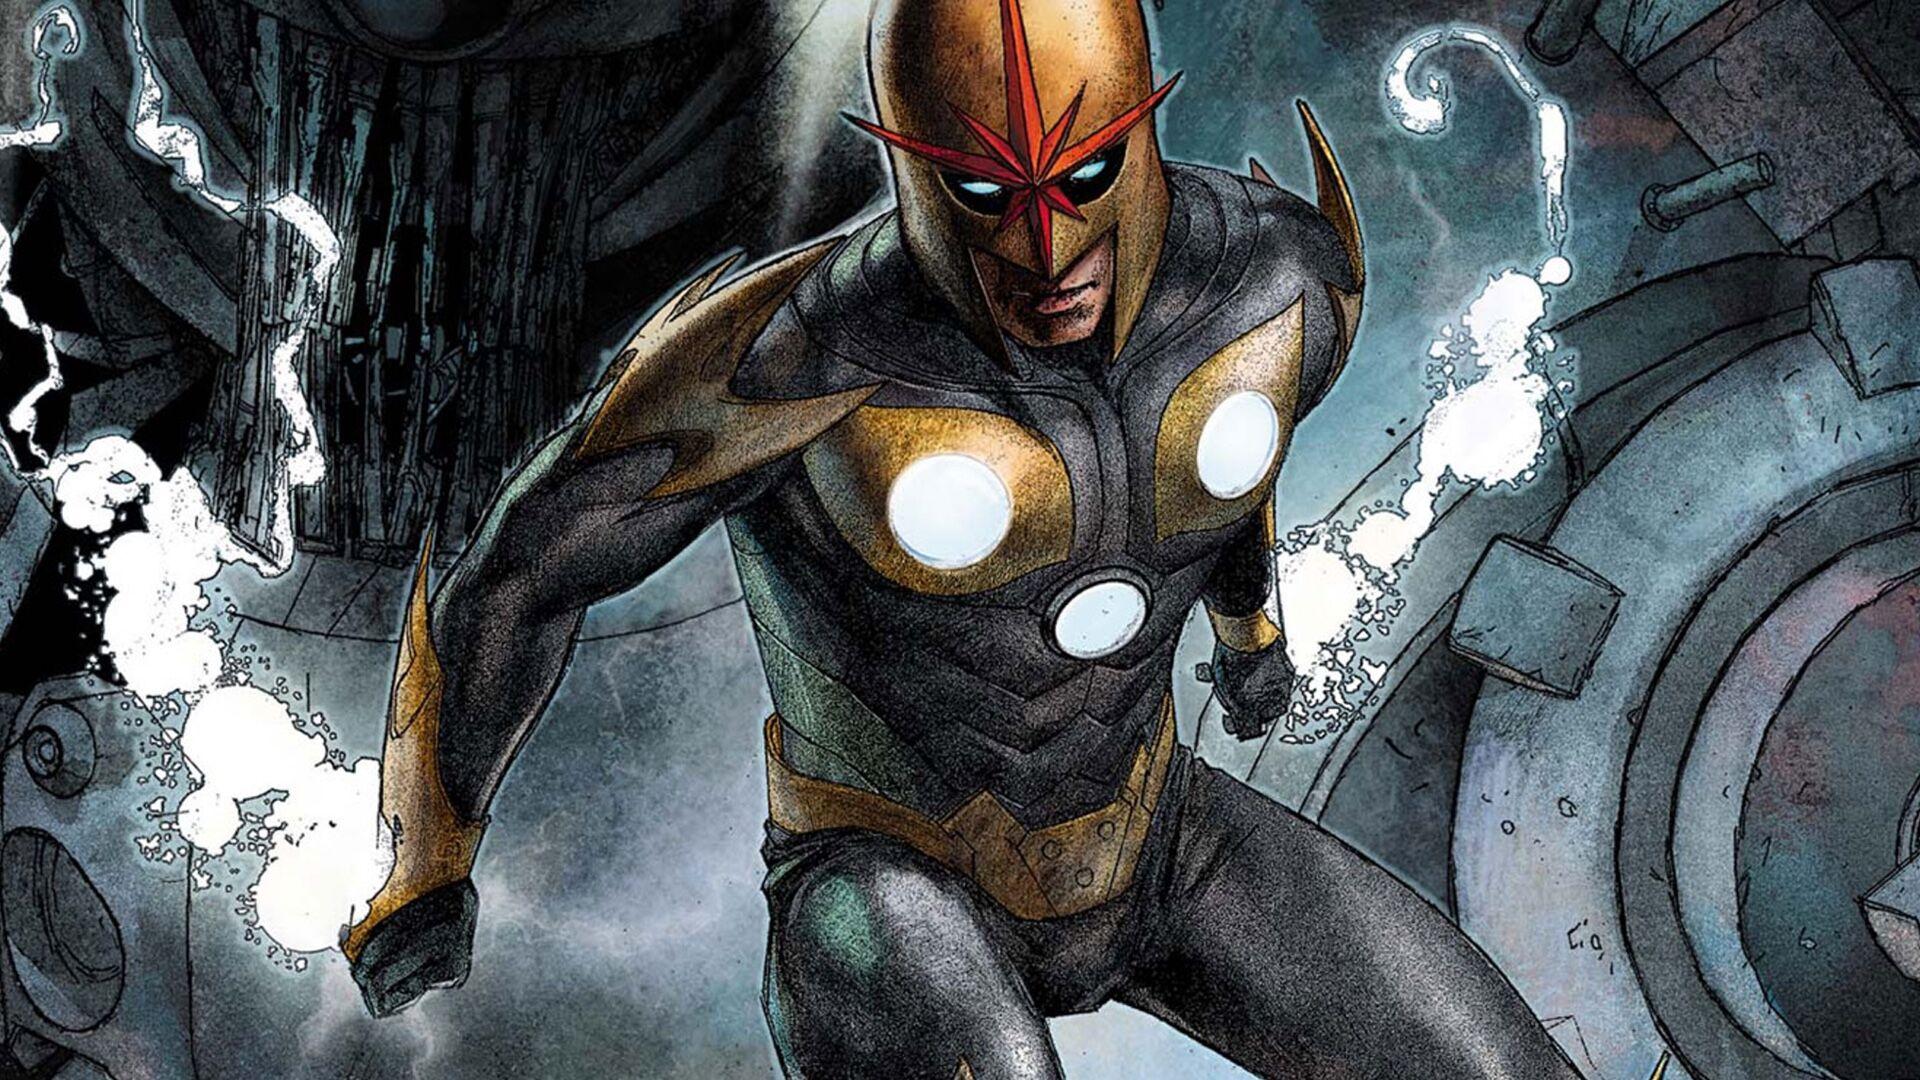 Report: A Nova movie is in development at Marvel Studios